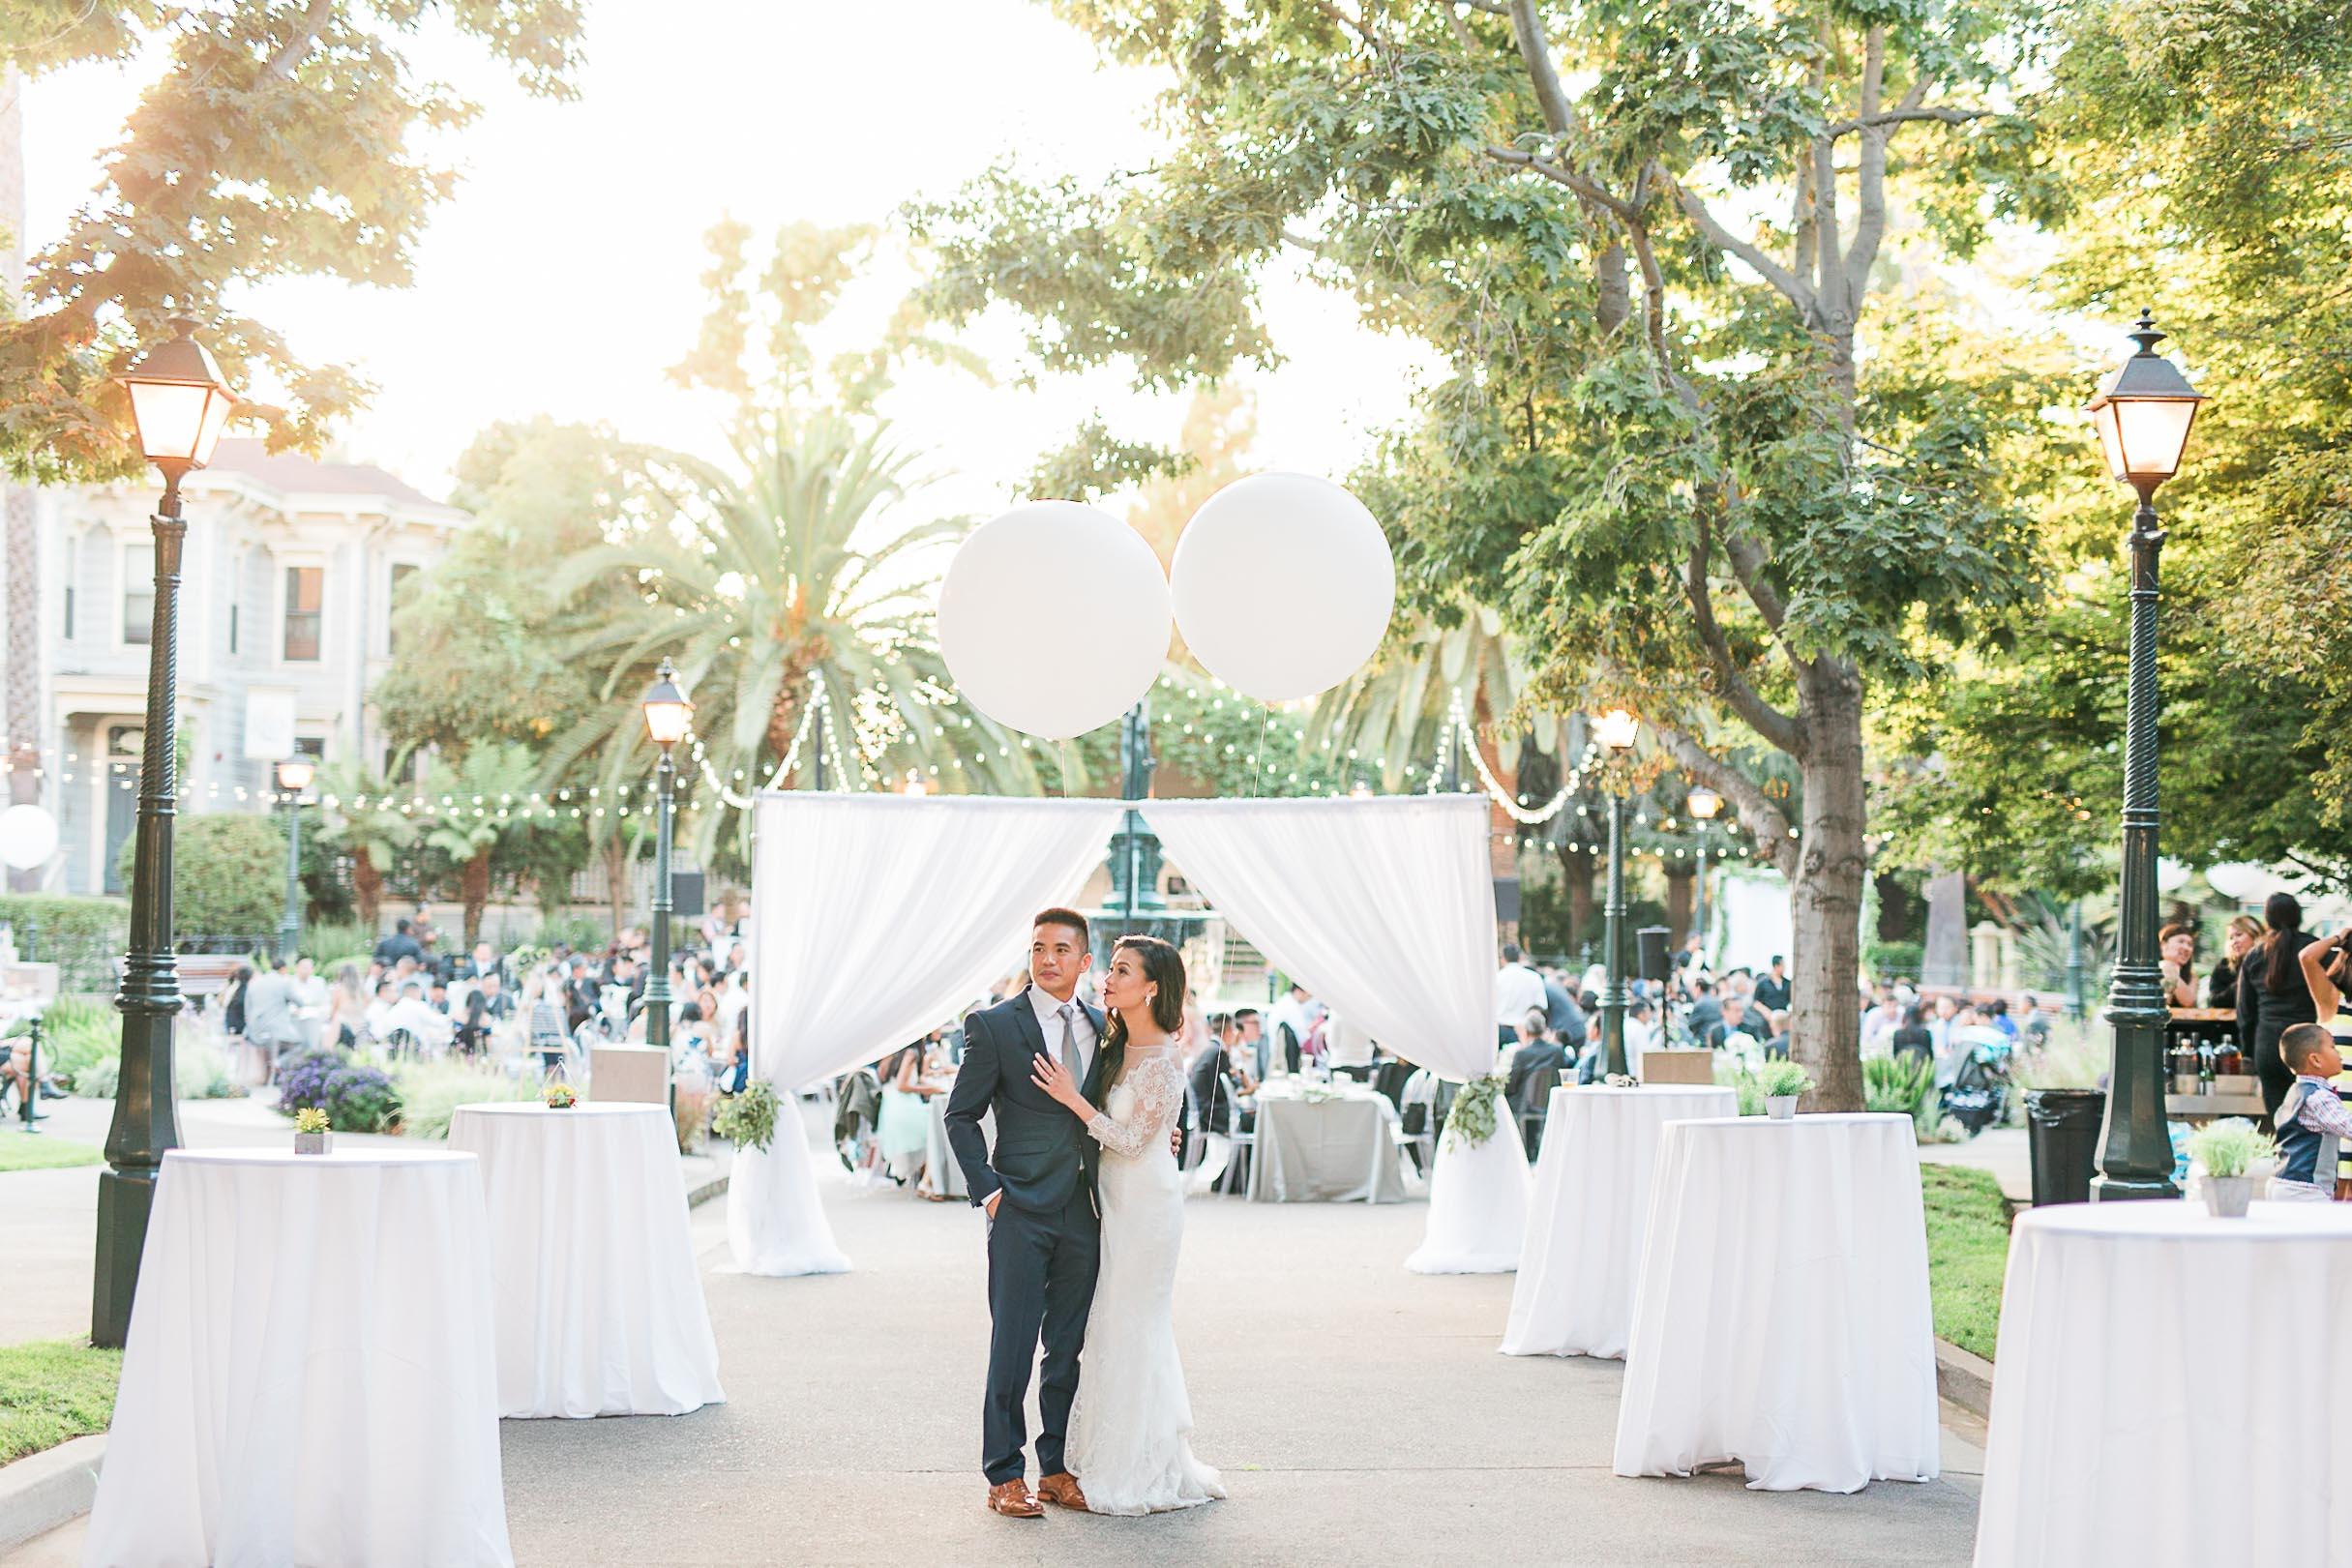 Wedding at Preservation Park in Oakland - Preservation Park Wedding Photos by JBJ Pictures San Francisco Photographer (58).jpg